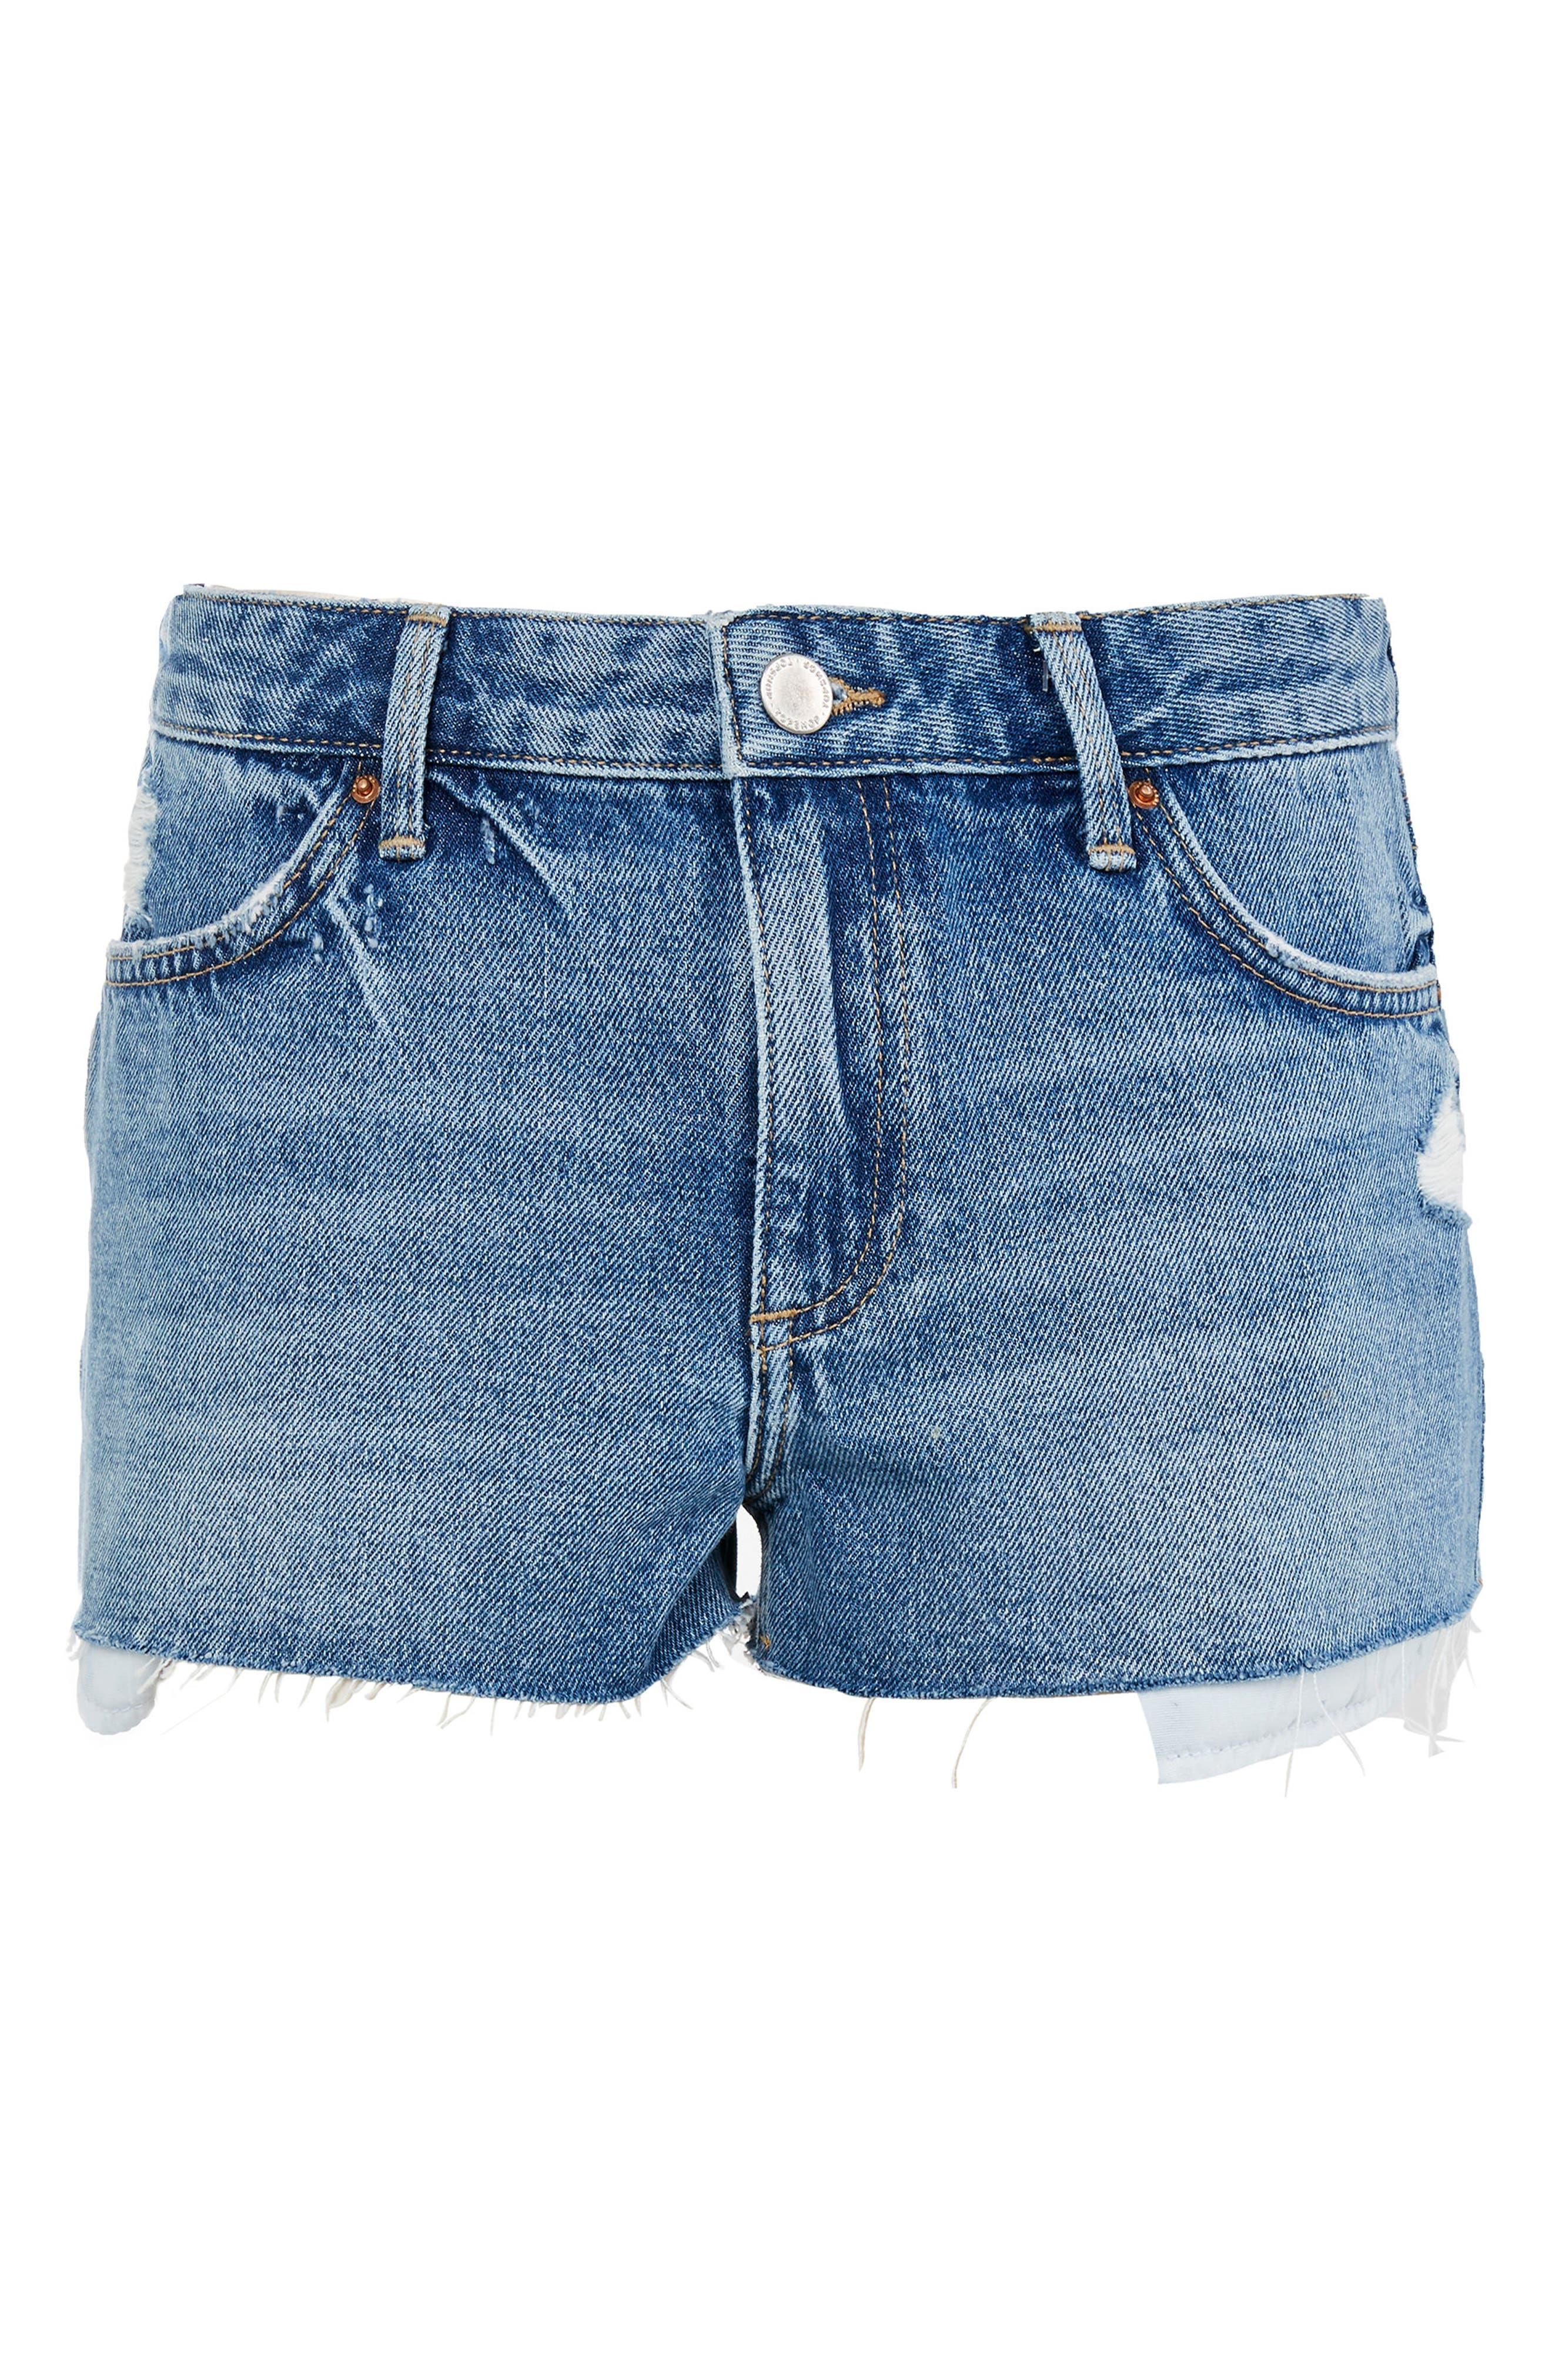 Alternate Image 3  - Topshop Cory Moto Mid Denim Shorts